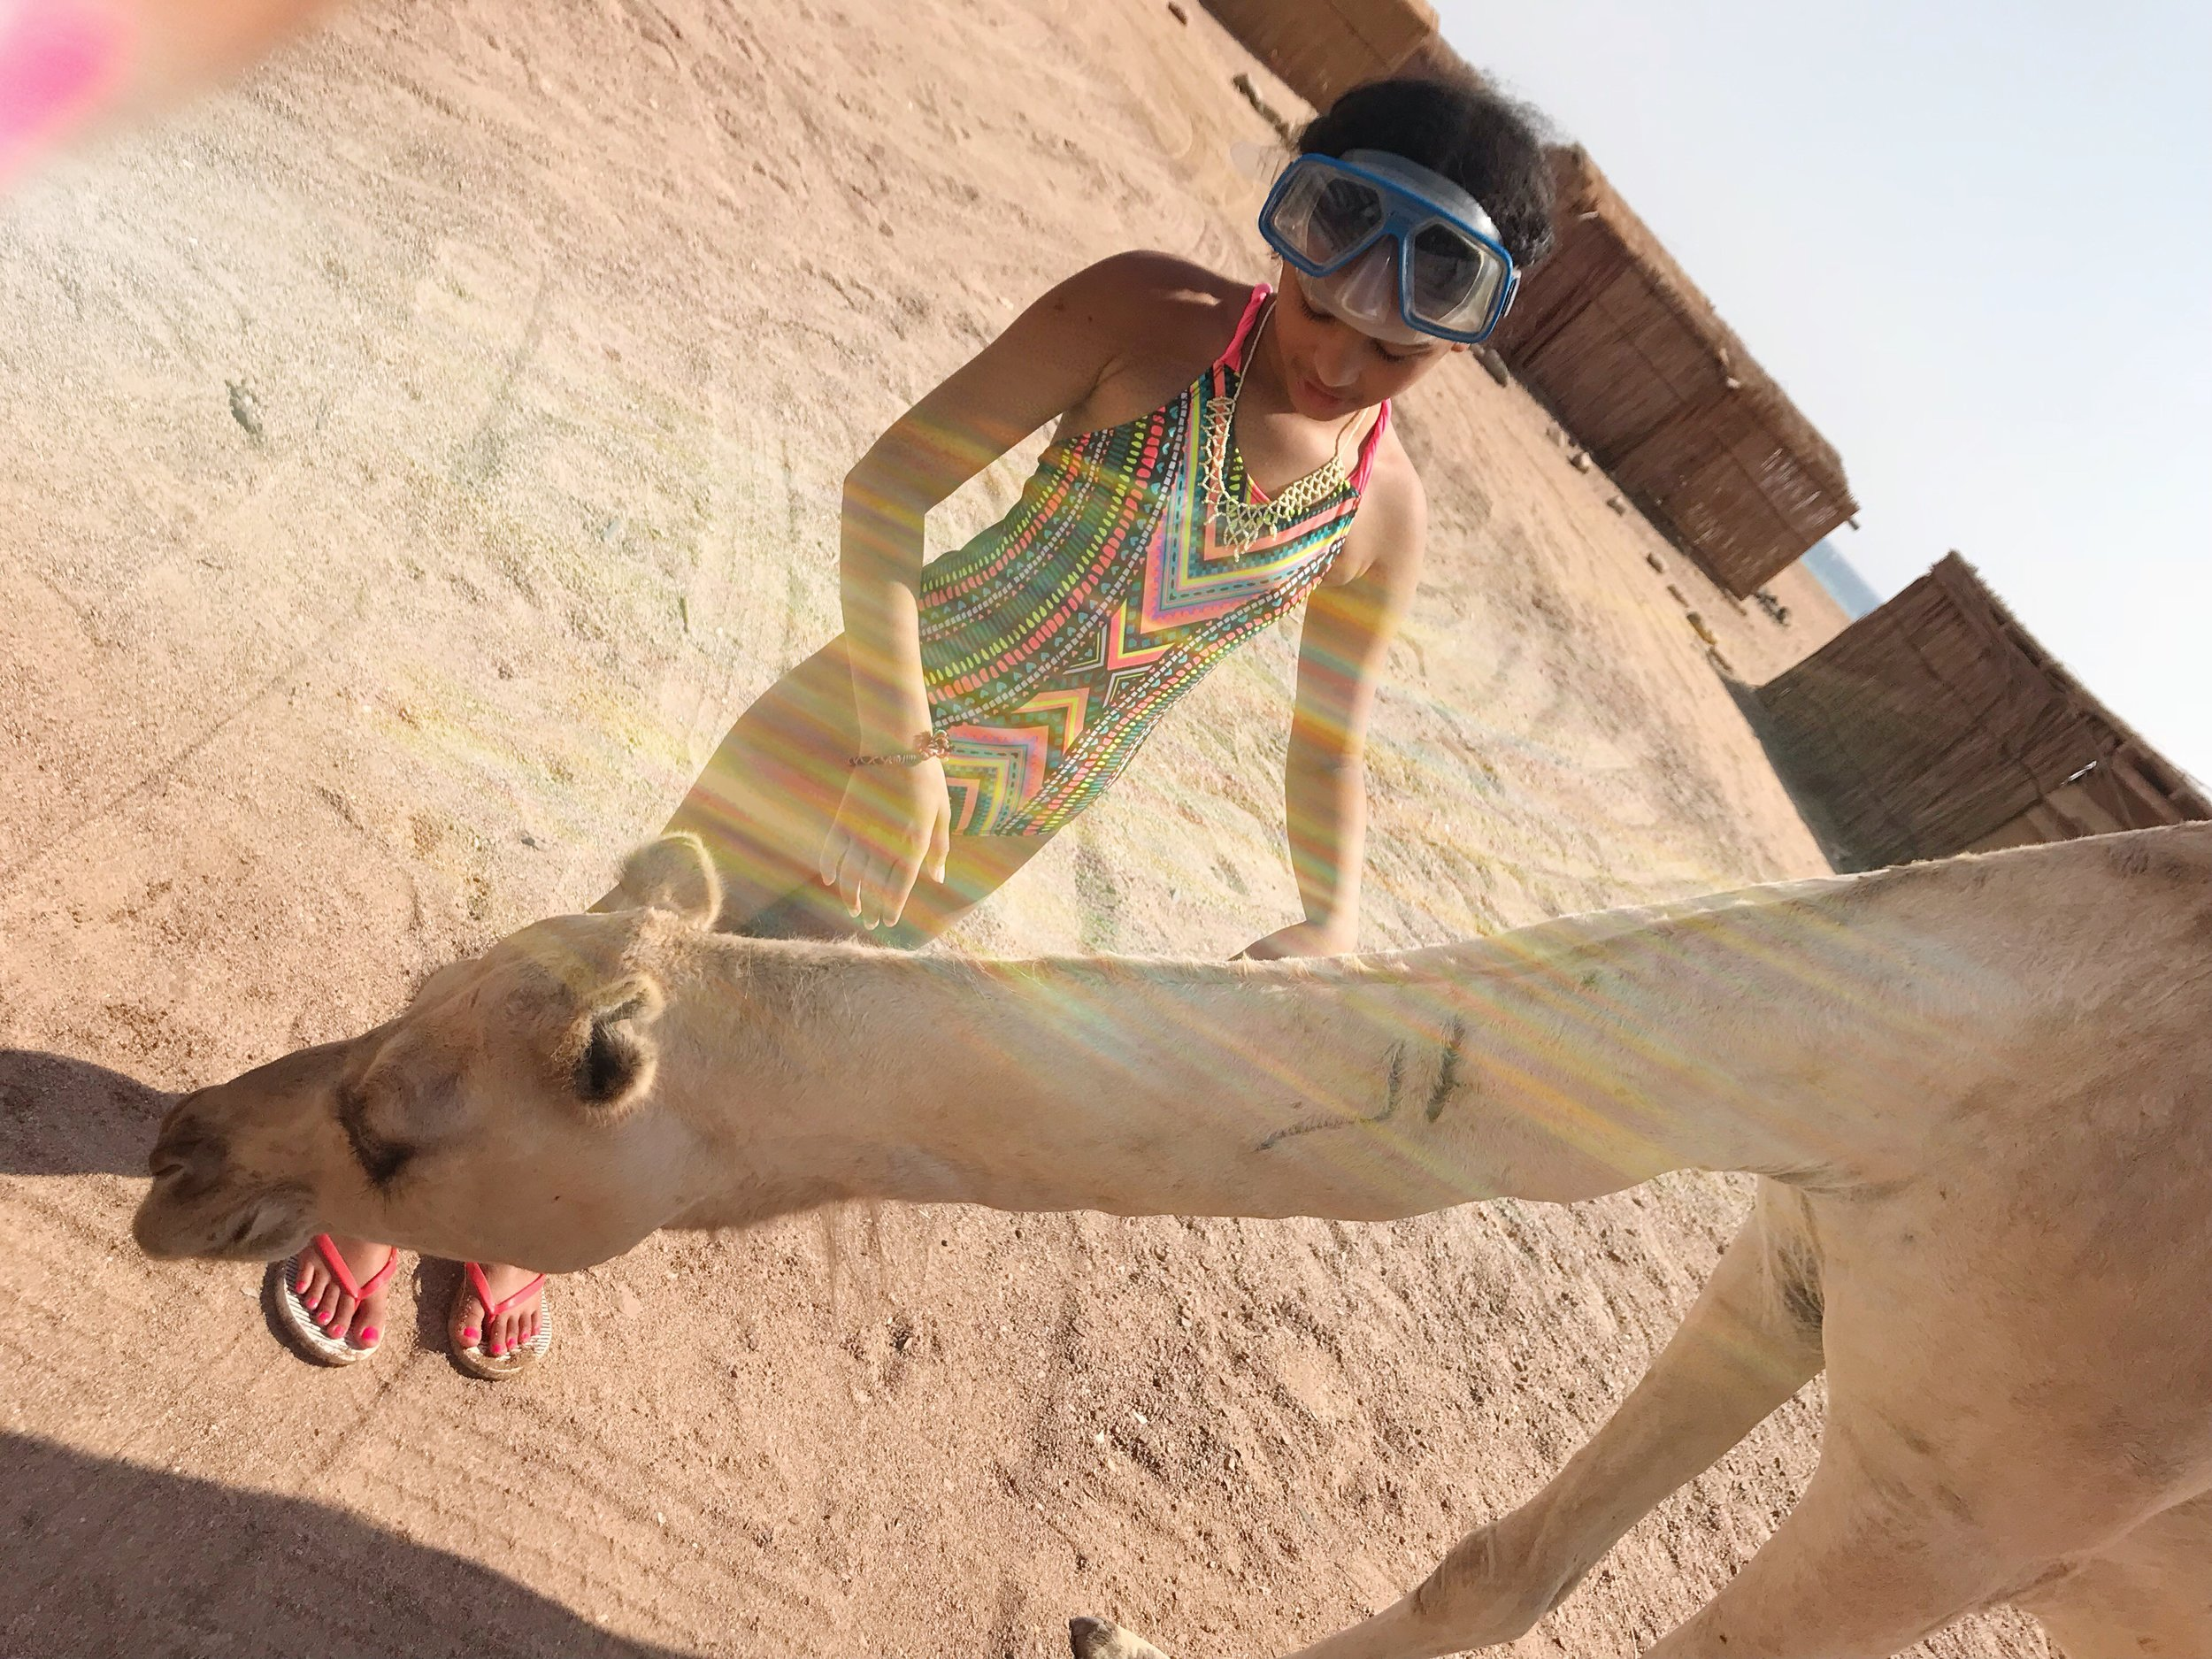 Ras Abu Galum, Egypt